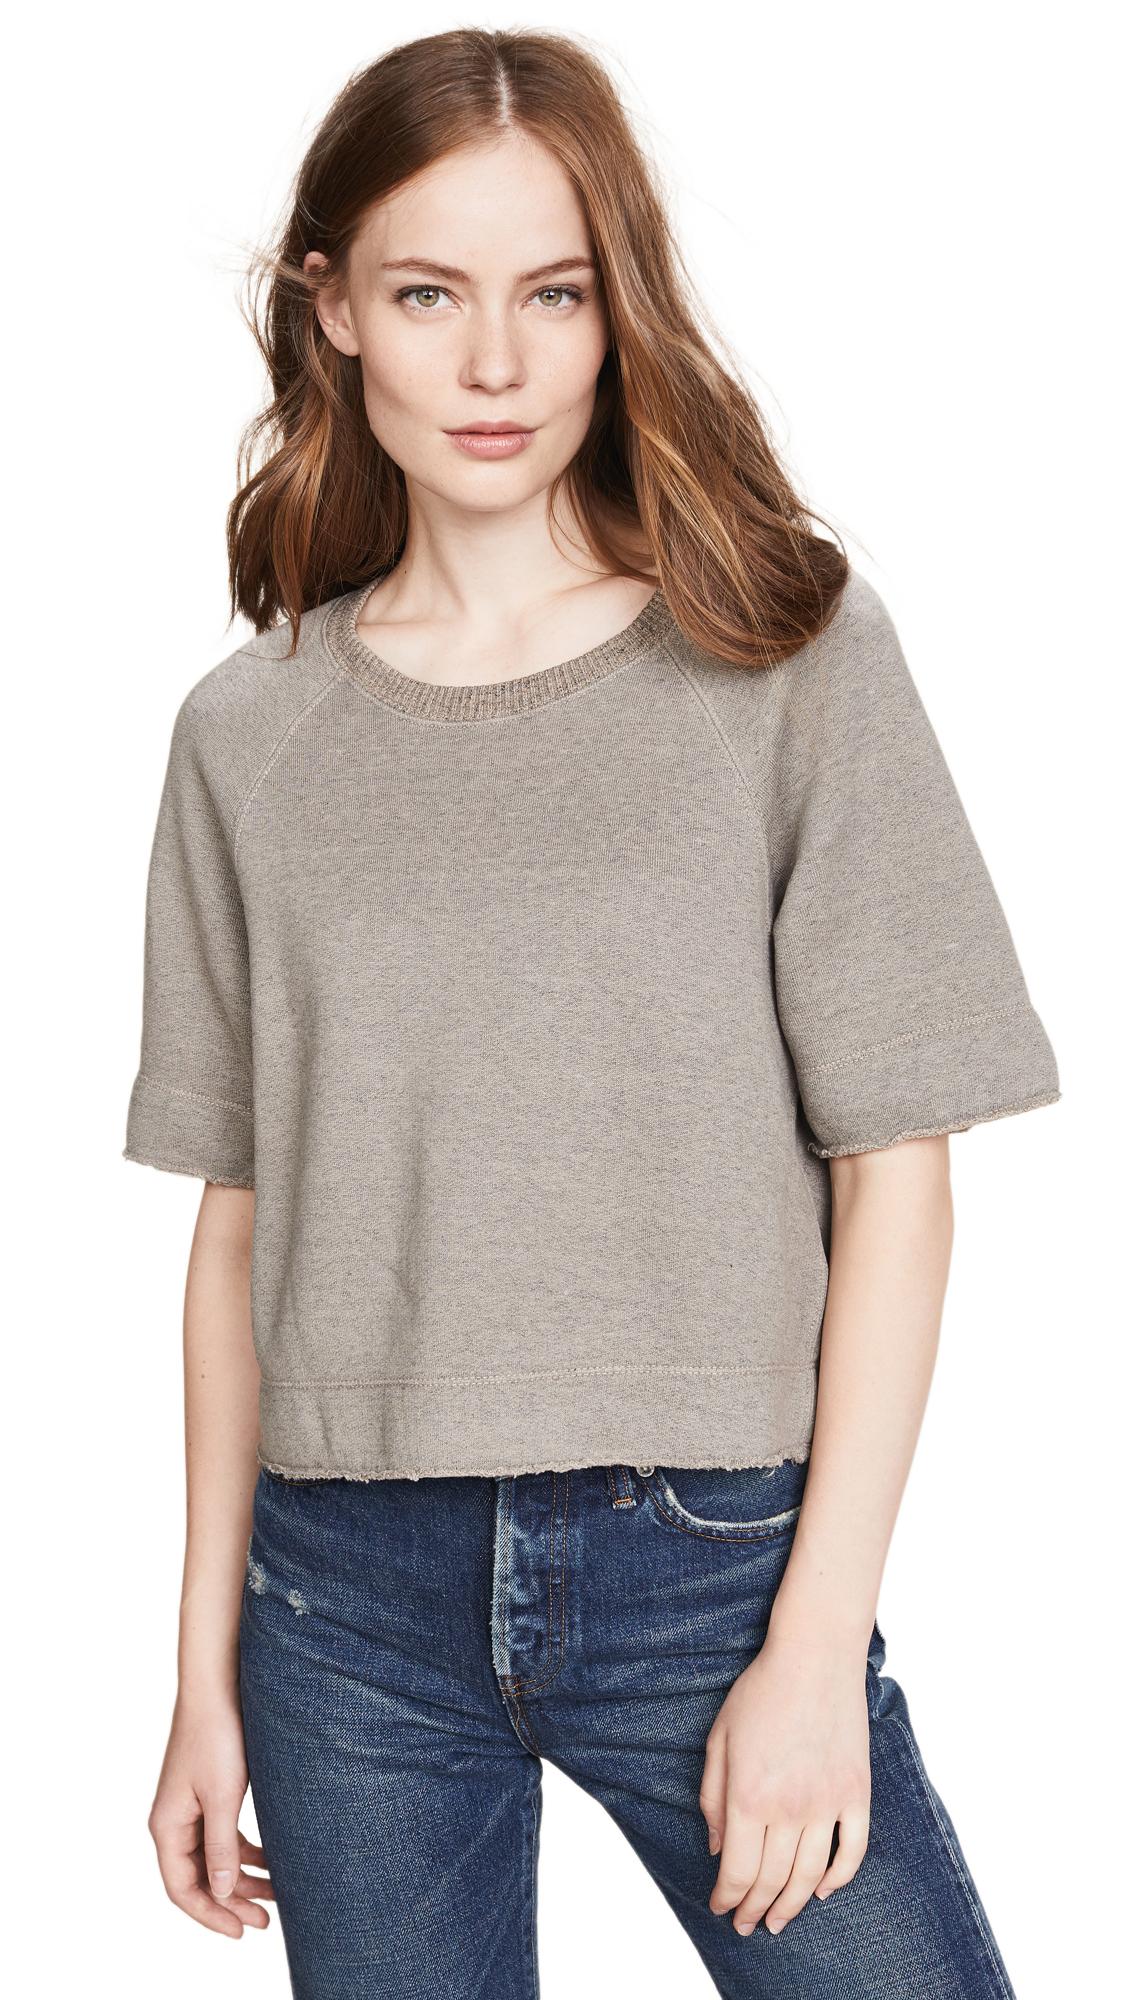 Boxy Sweatshirt in Heather Yak